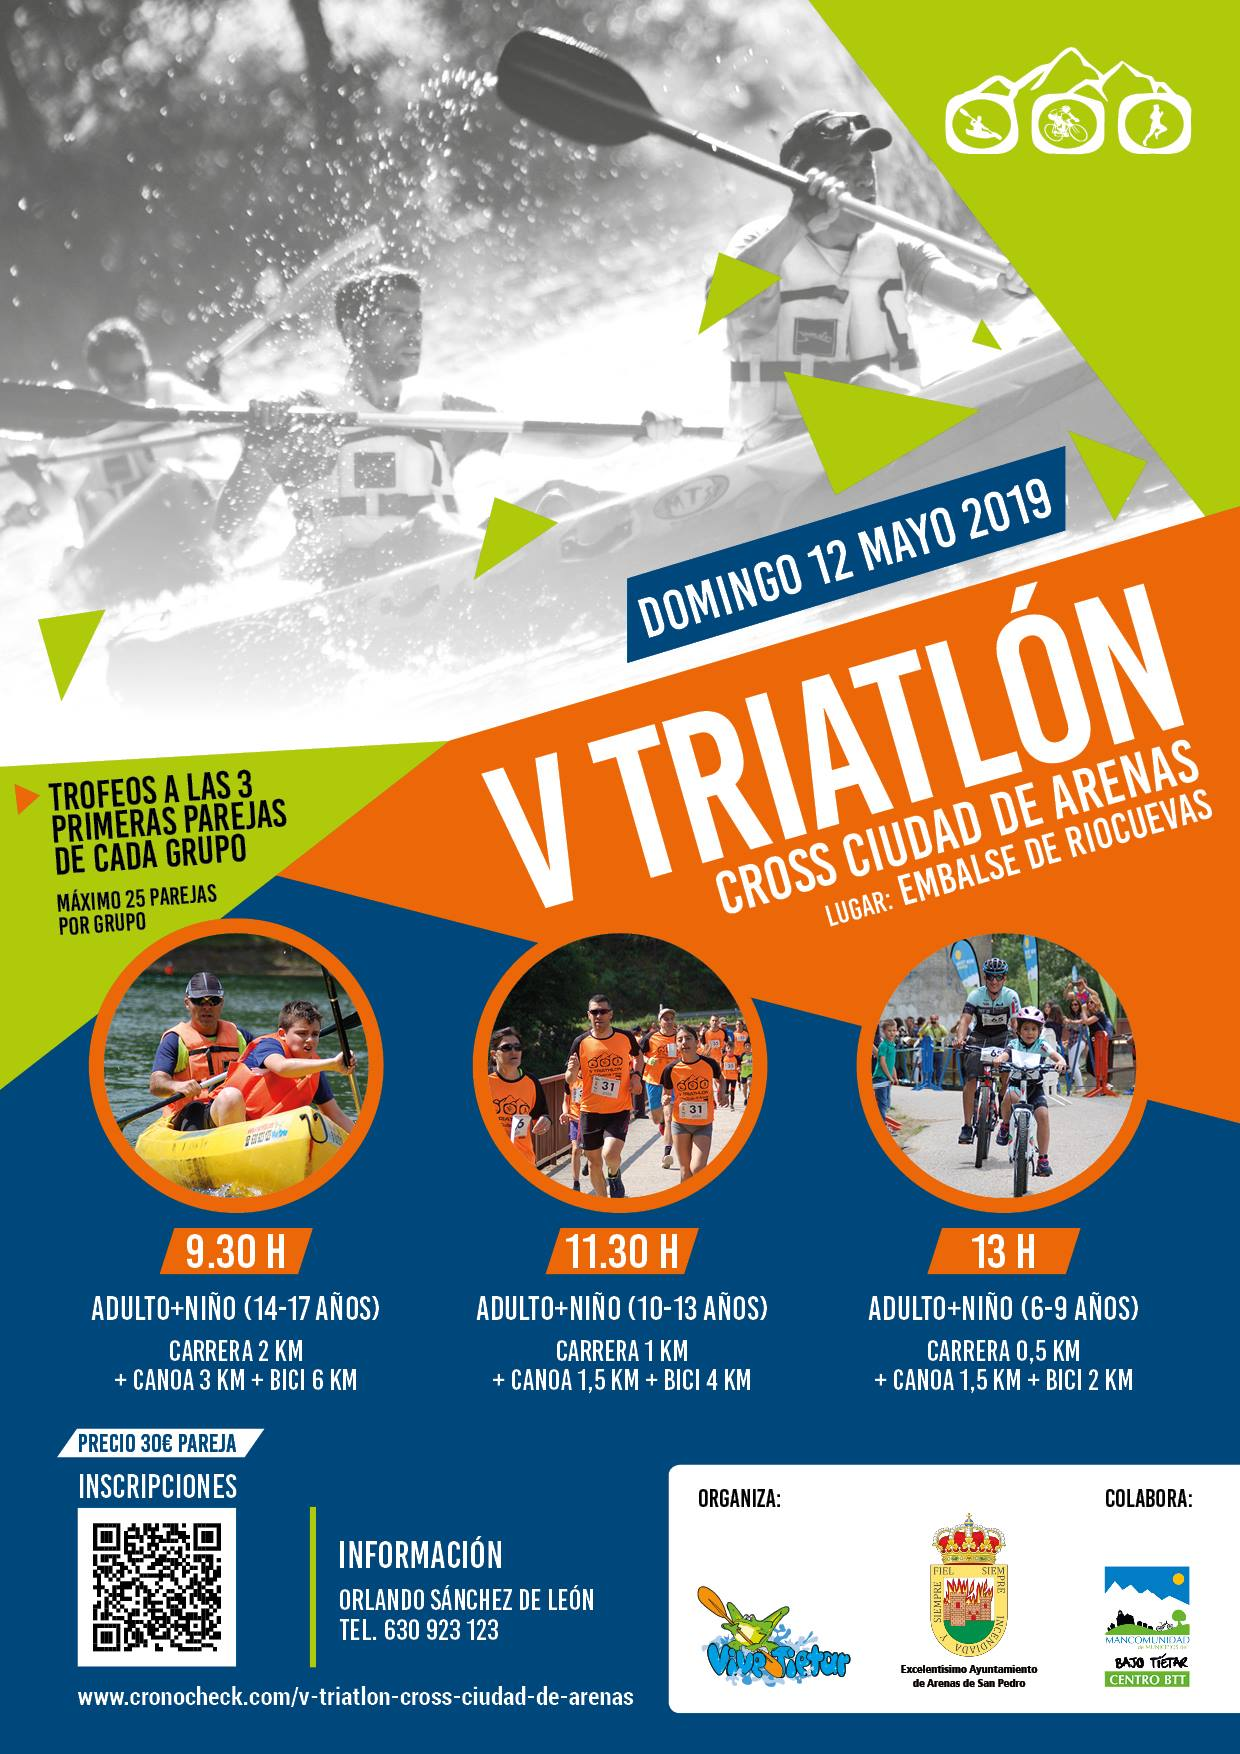 V Triatlón Cross Ciudad de Arenas - Arenas de San Pedro - TiétarTeVe